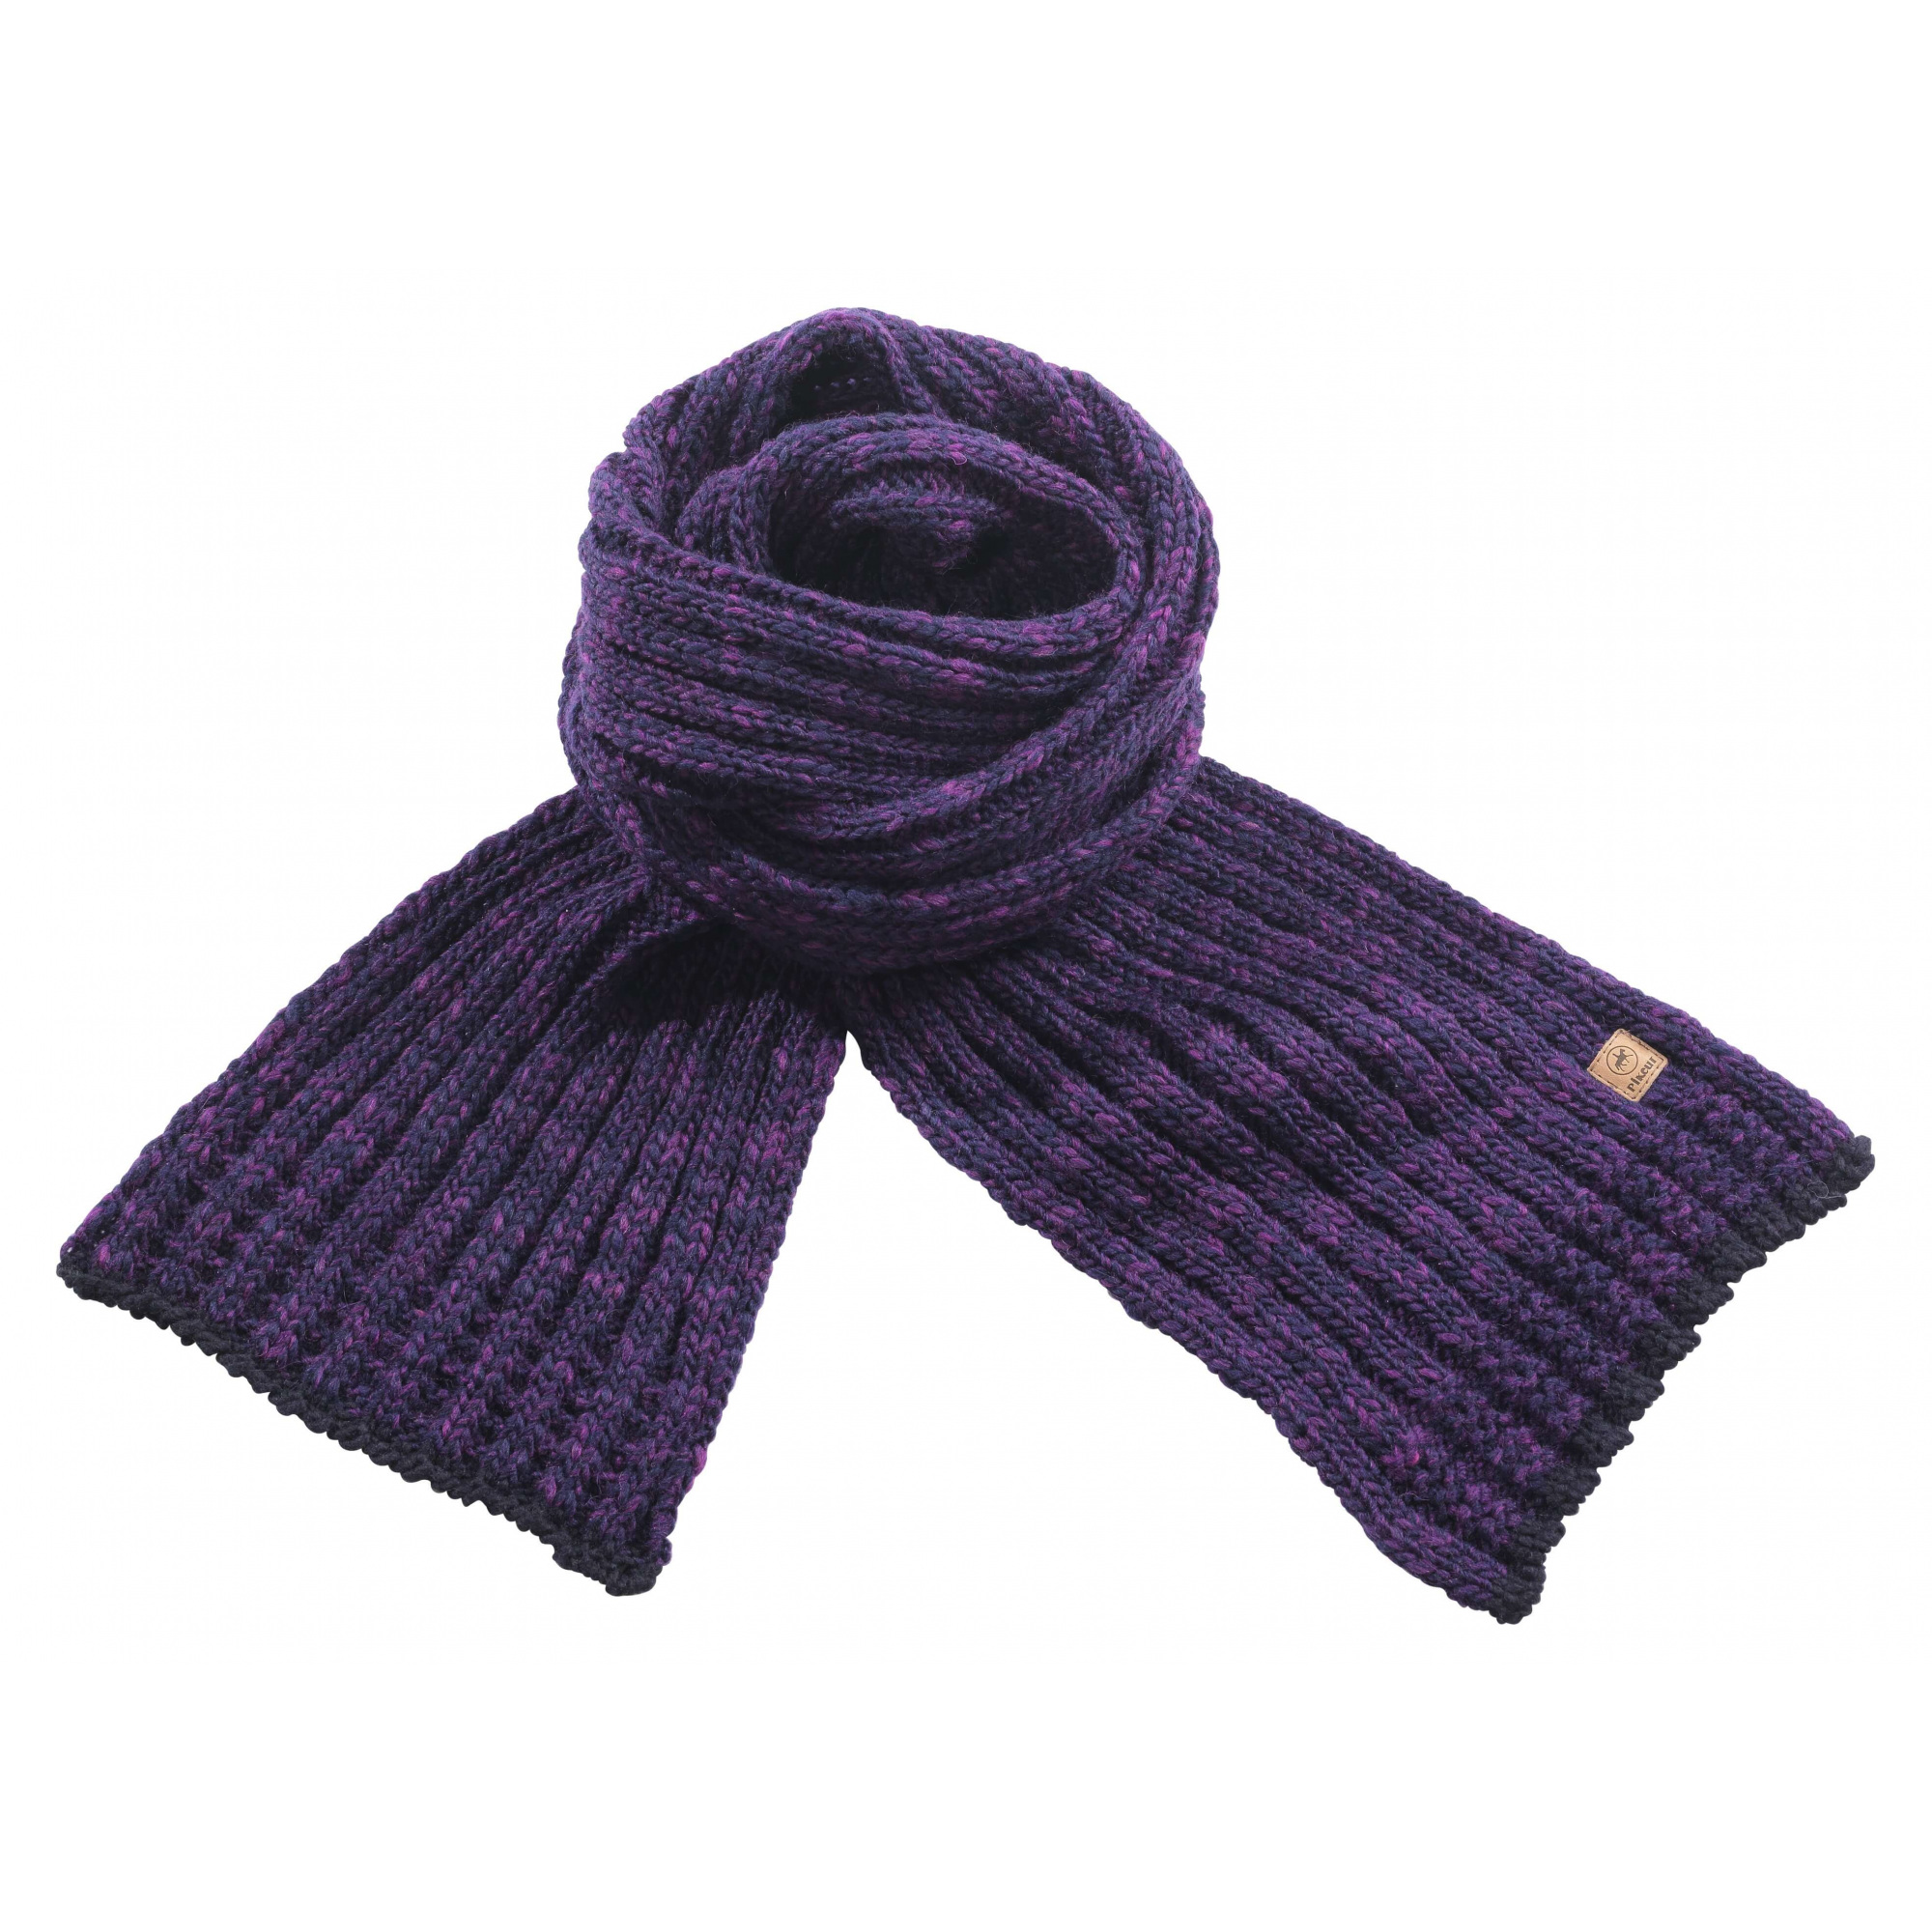 woolen unisex scarf w14 equishop equestrian shop